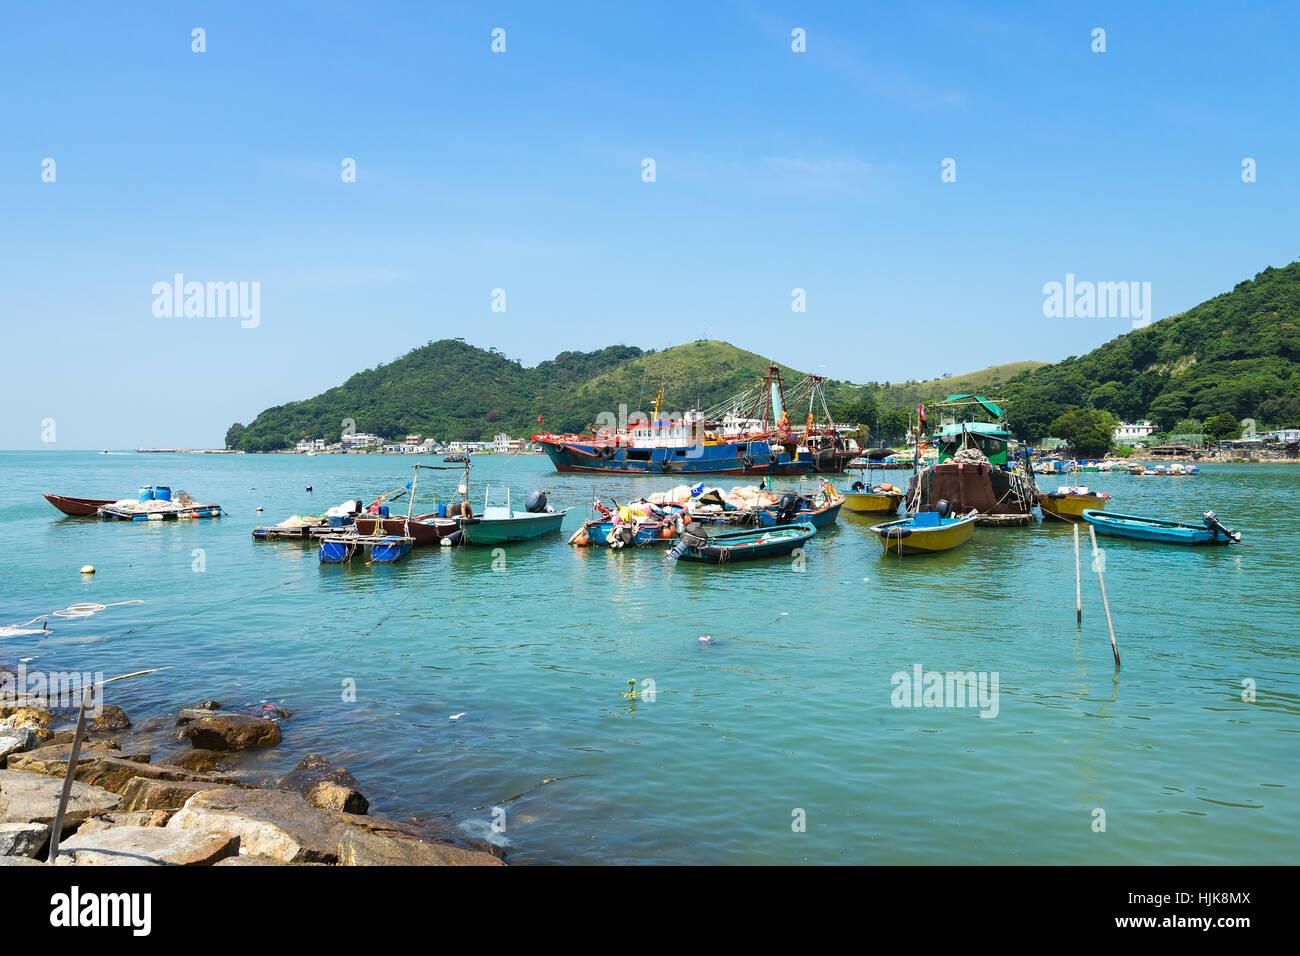 Tai O Fishing Village of Lantau Island in Hong Kong, China. - Stock Image